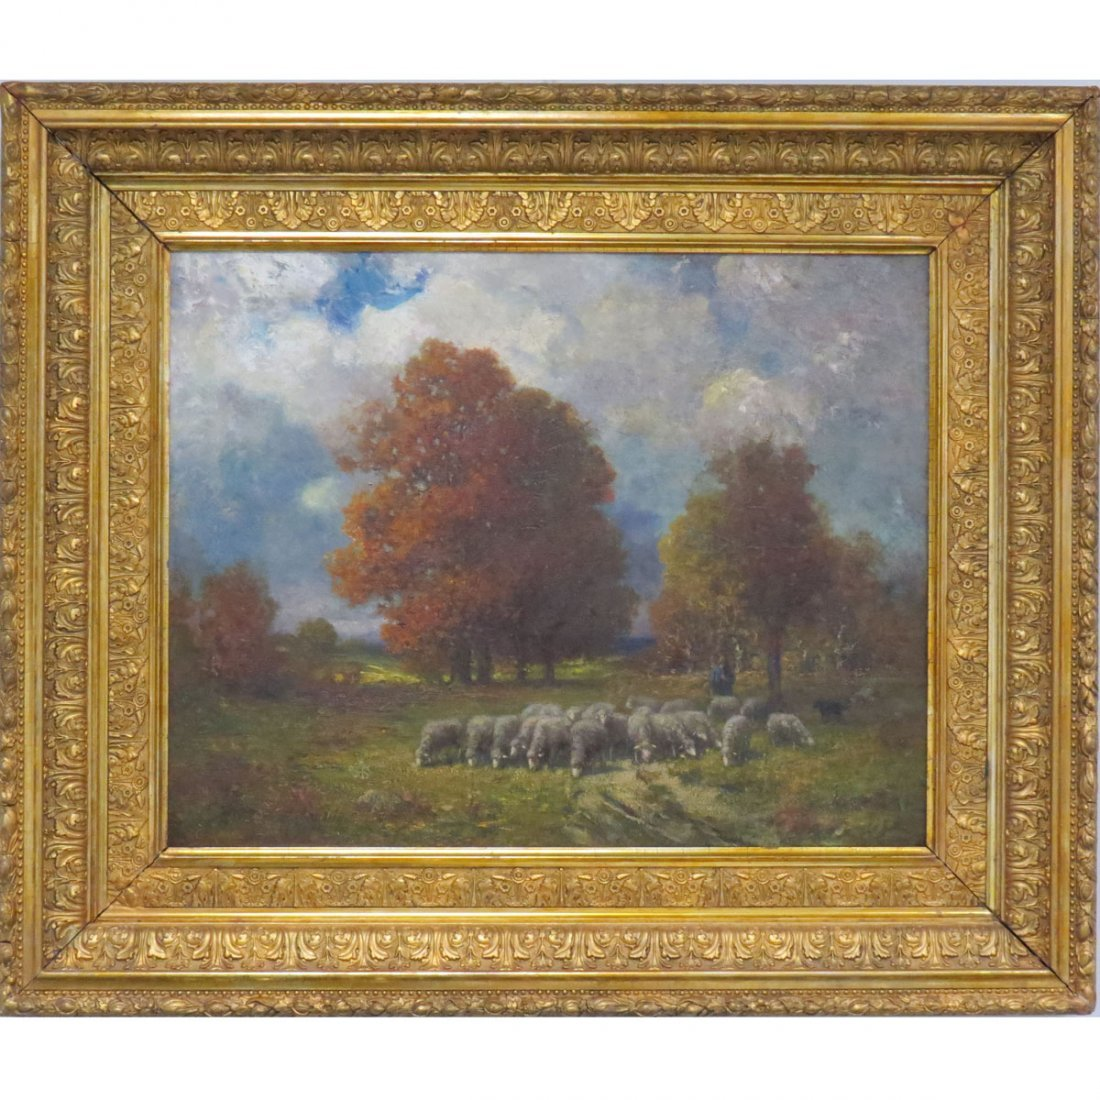 RICHARD CREIFELDS (AMERICAN 1853-1939), OIL